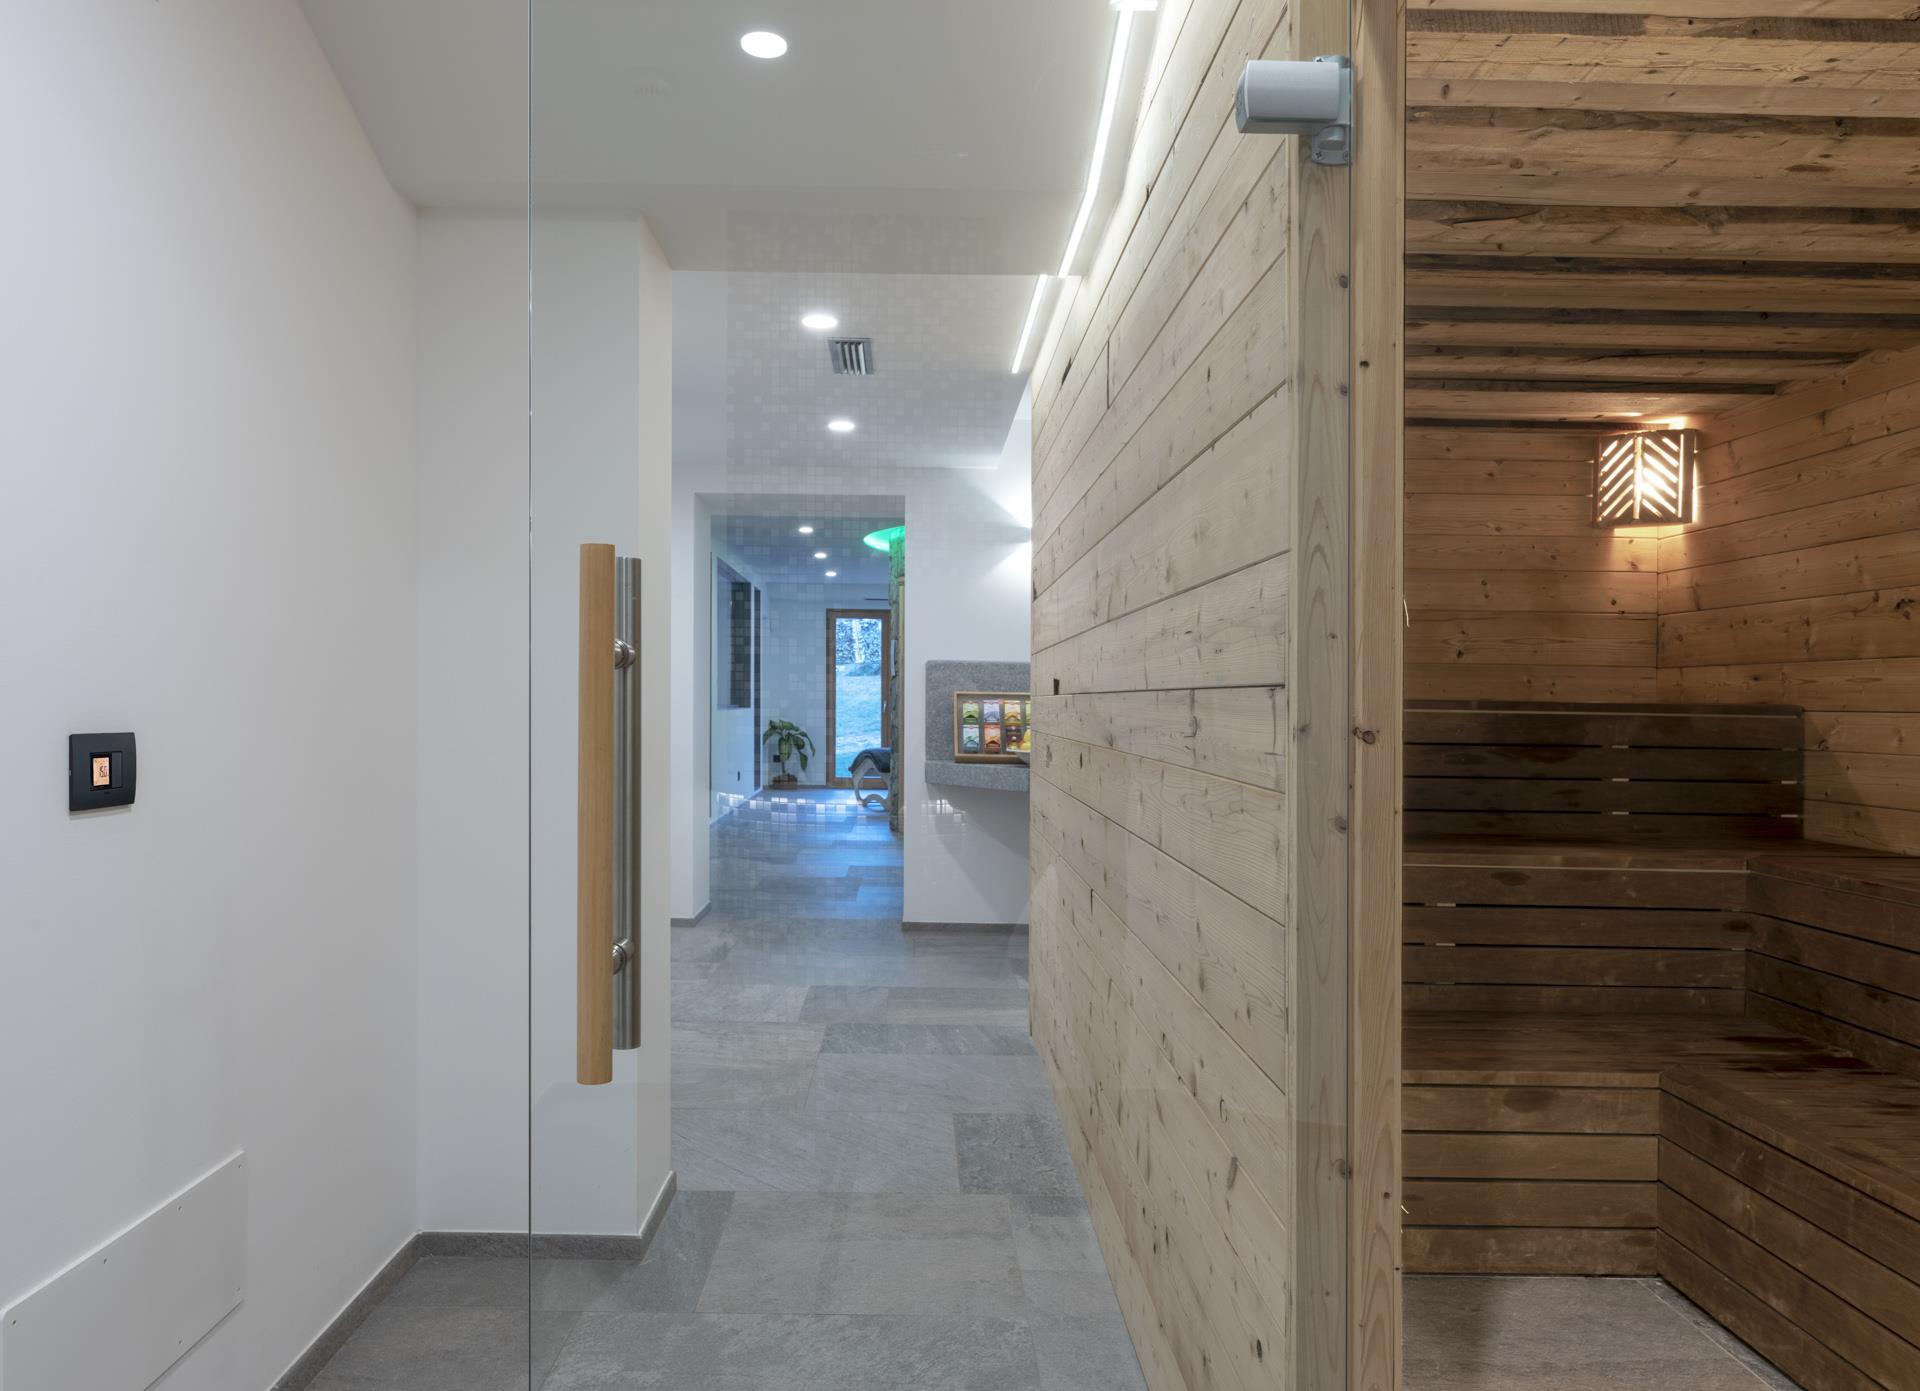 vimar-hotel-aurai-sauna